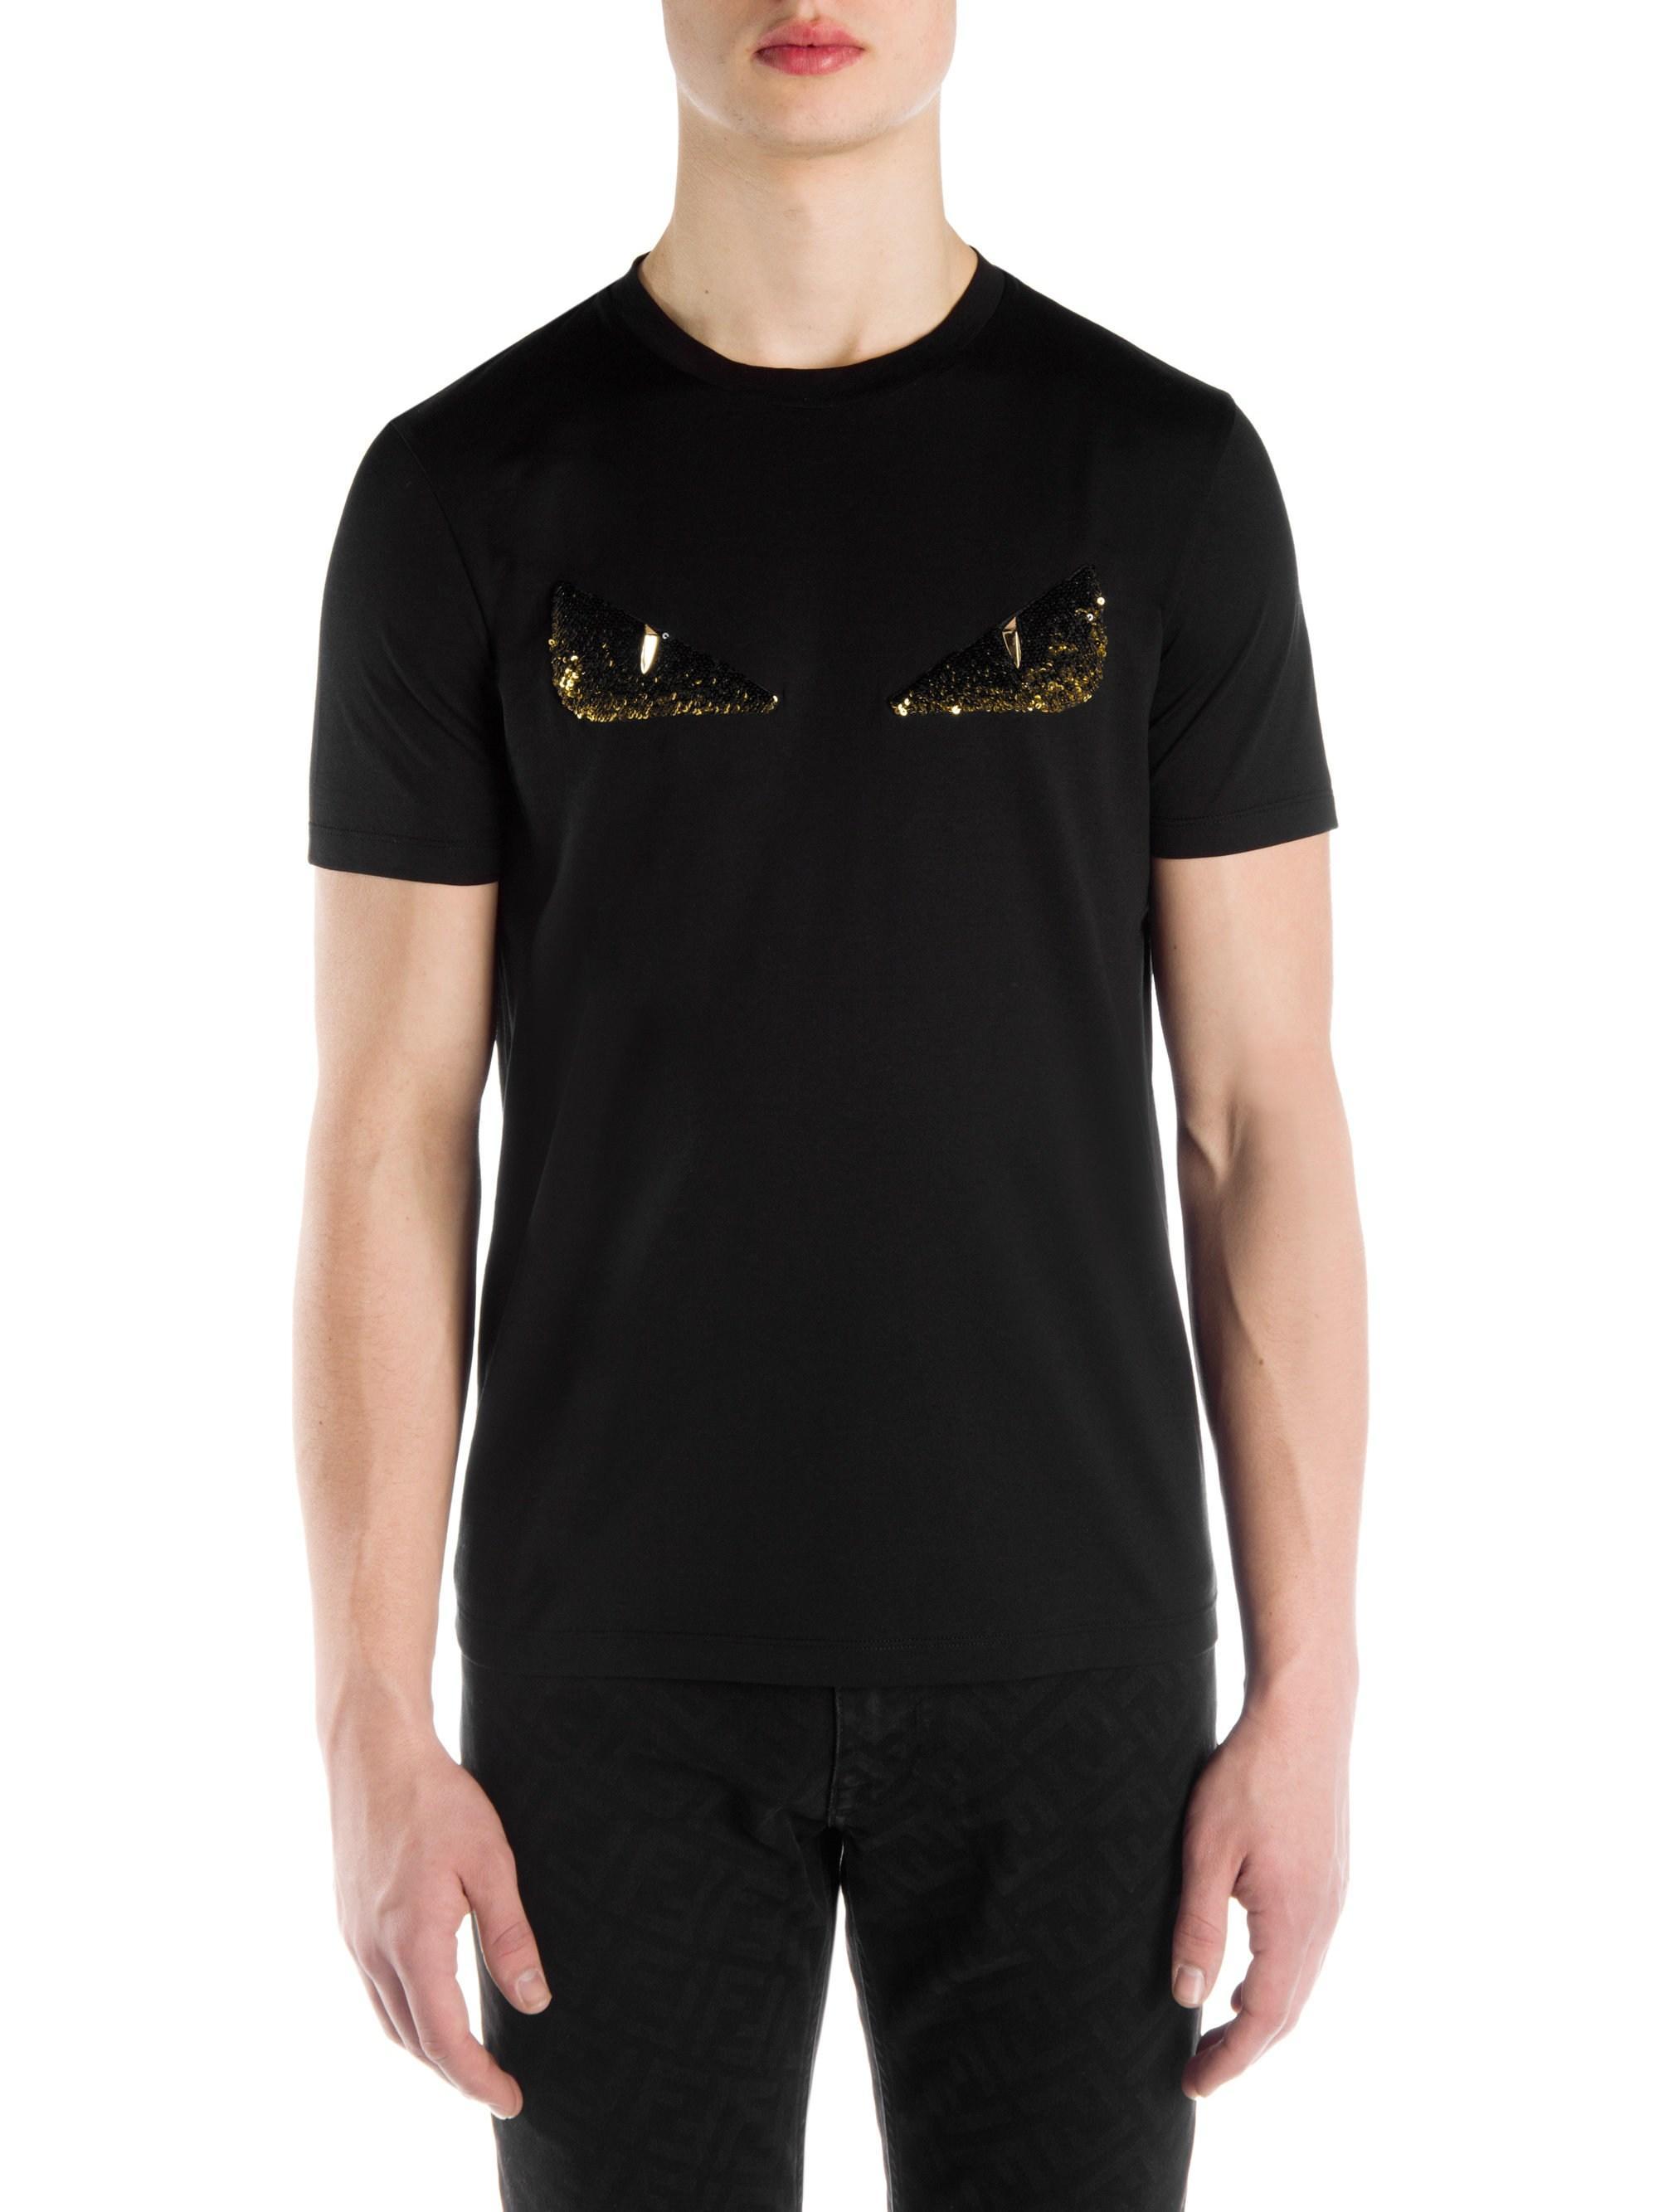 8388fa3a Fendi - Men's Embellished Eye Graphic T-shirt - Black for Men - Lyst. View  fullscreen